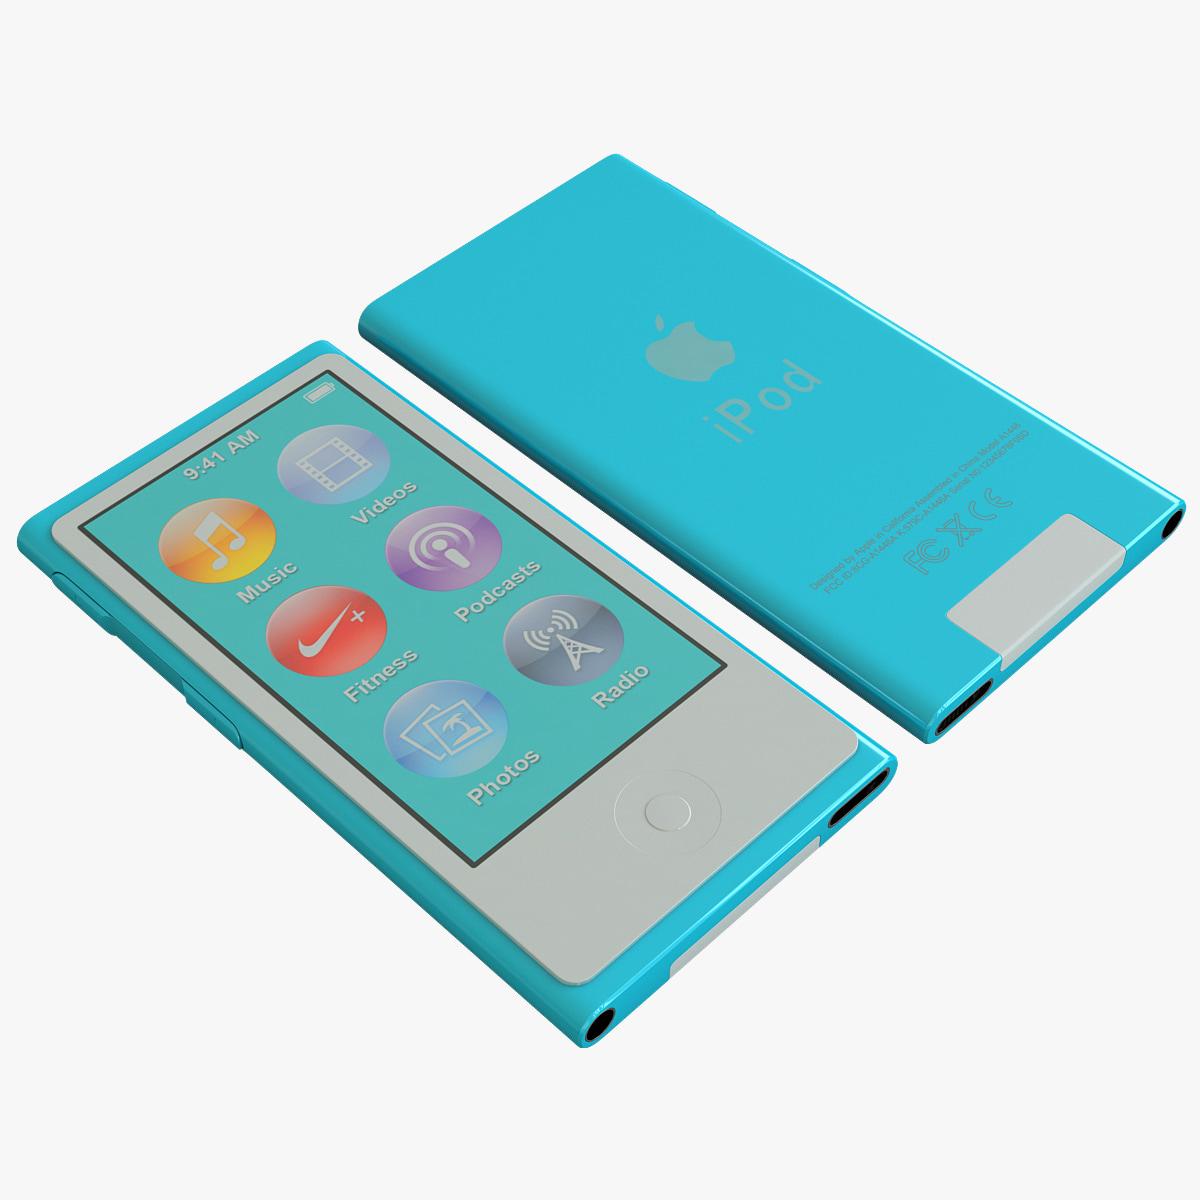 Ipod_Nano_Generation_7th_Blue_000.jpg